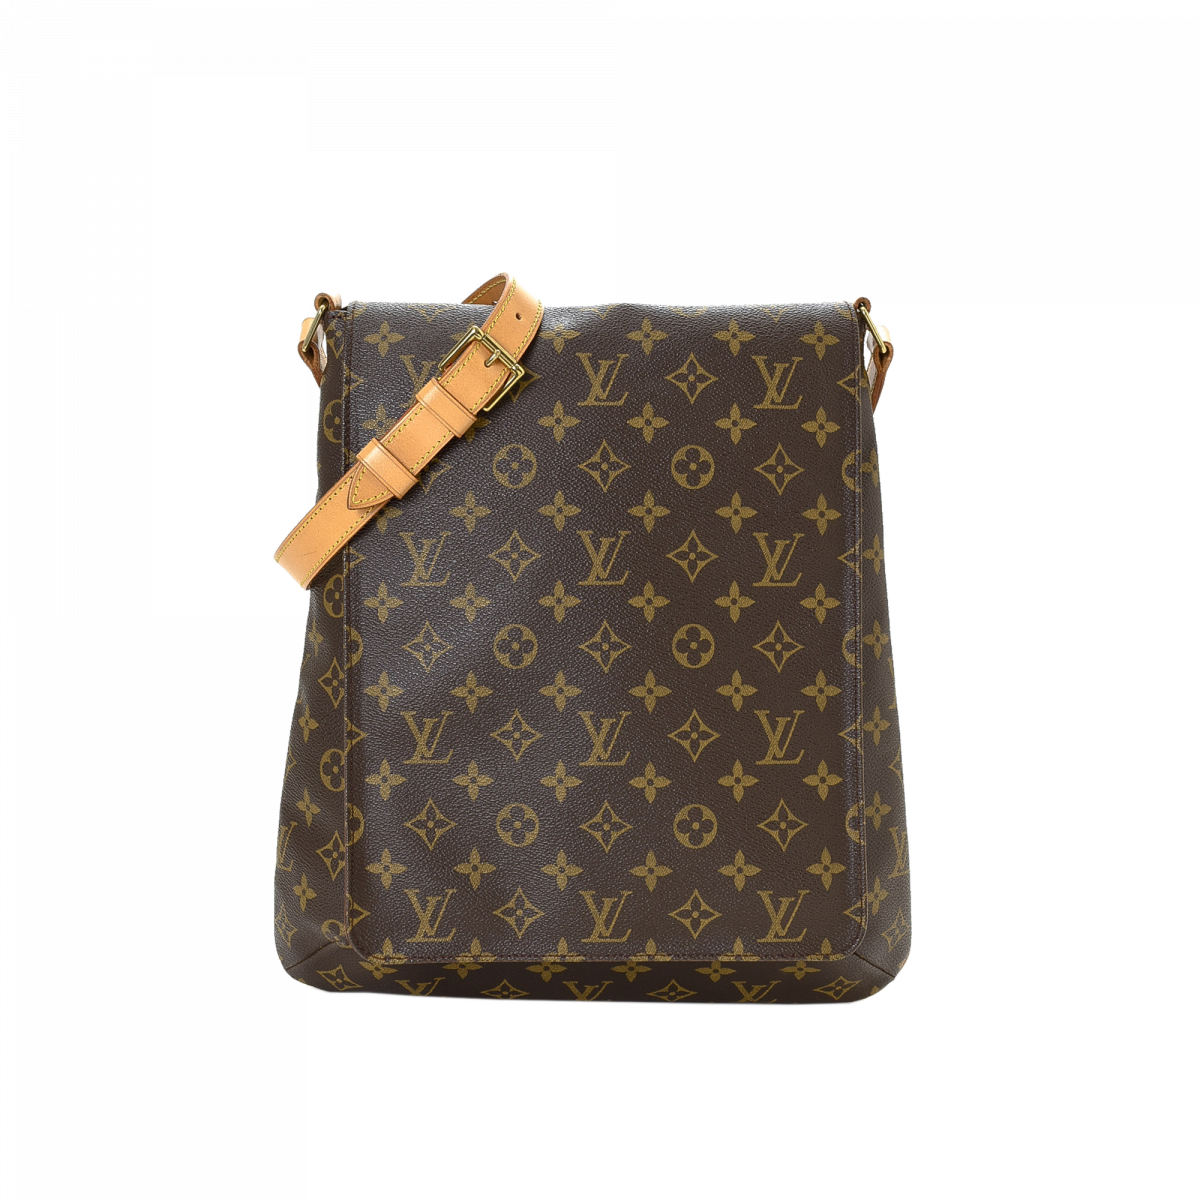 Louis Vuitton Musette Monogram Coated Canvas -  Louis Vuitton Musette  - #AlexaChung #AngelaSimmons #CannesFilmFestival #Canvas #CelebritiesFashion #CelebrityStyle #coated #CurvyPetiteFashion #DianeKruger #EmmaRoberts #FashionDesigners #FashionTrends #KendallJennerOutfits #KimKardashian #Louis #LouisVuitton #LouisVuittonHandbags #LouisVuittonMonogram #LvHandbags #MichaelKorsBag #MiraDuma #MiroslavaDuma #Monogram #Musette #RachelBilson #RayBanOutlet #RayBanSunglasses #RayBans #RedCarpetDresses #